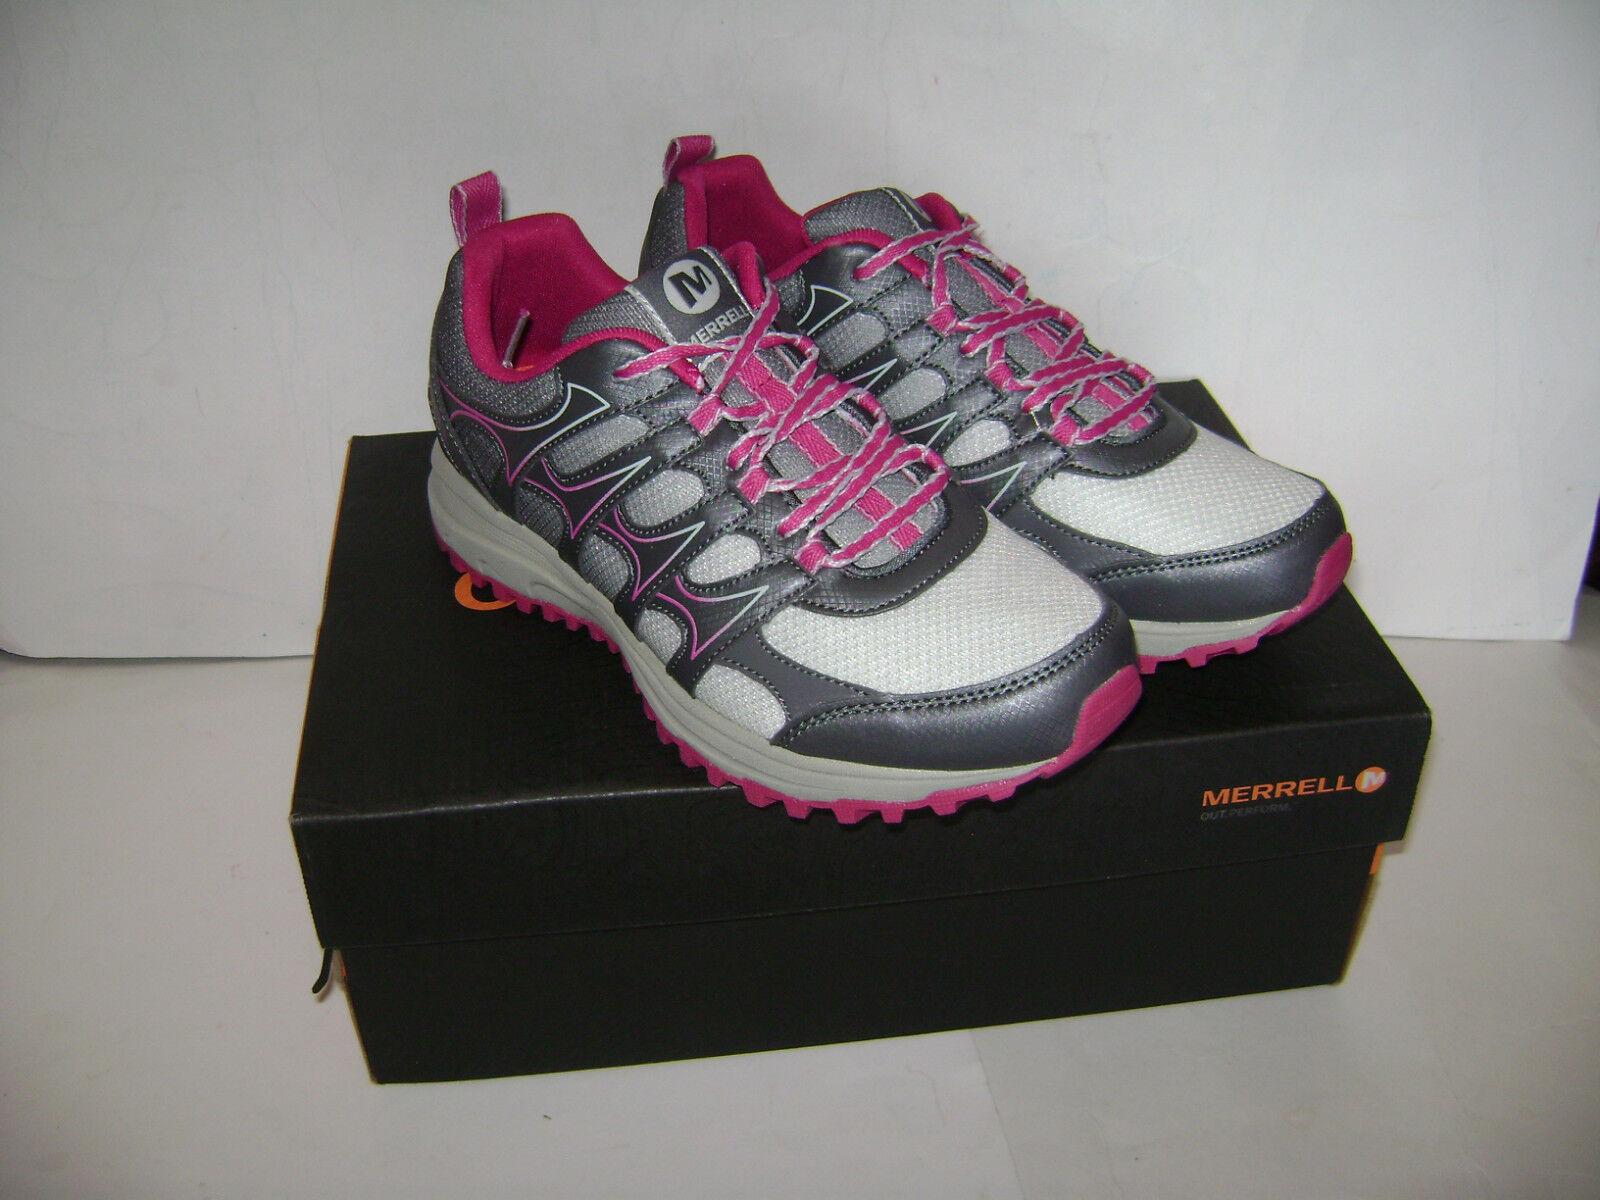 NIB MERRELL ACTIVE TREK WOMEN TRAIL GRANITE Schuhe Größe 8.5 M GRANITE TRAIL VIVACIOUS 650549